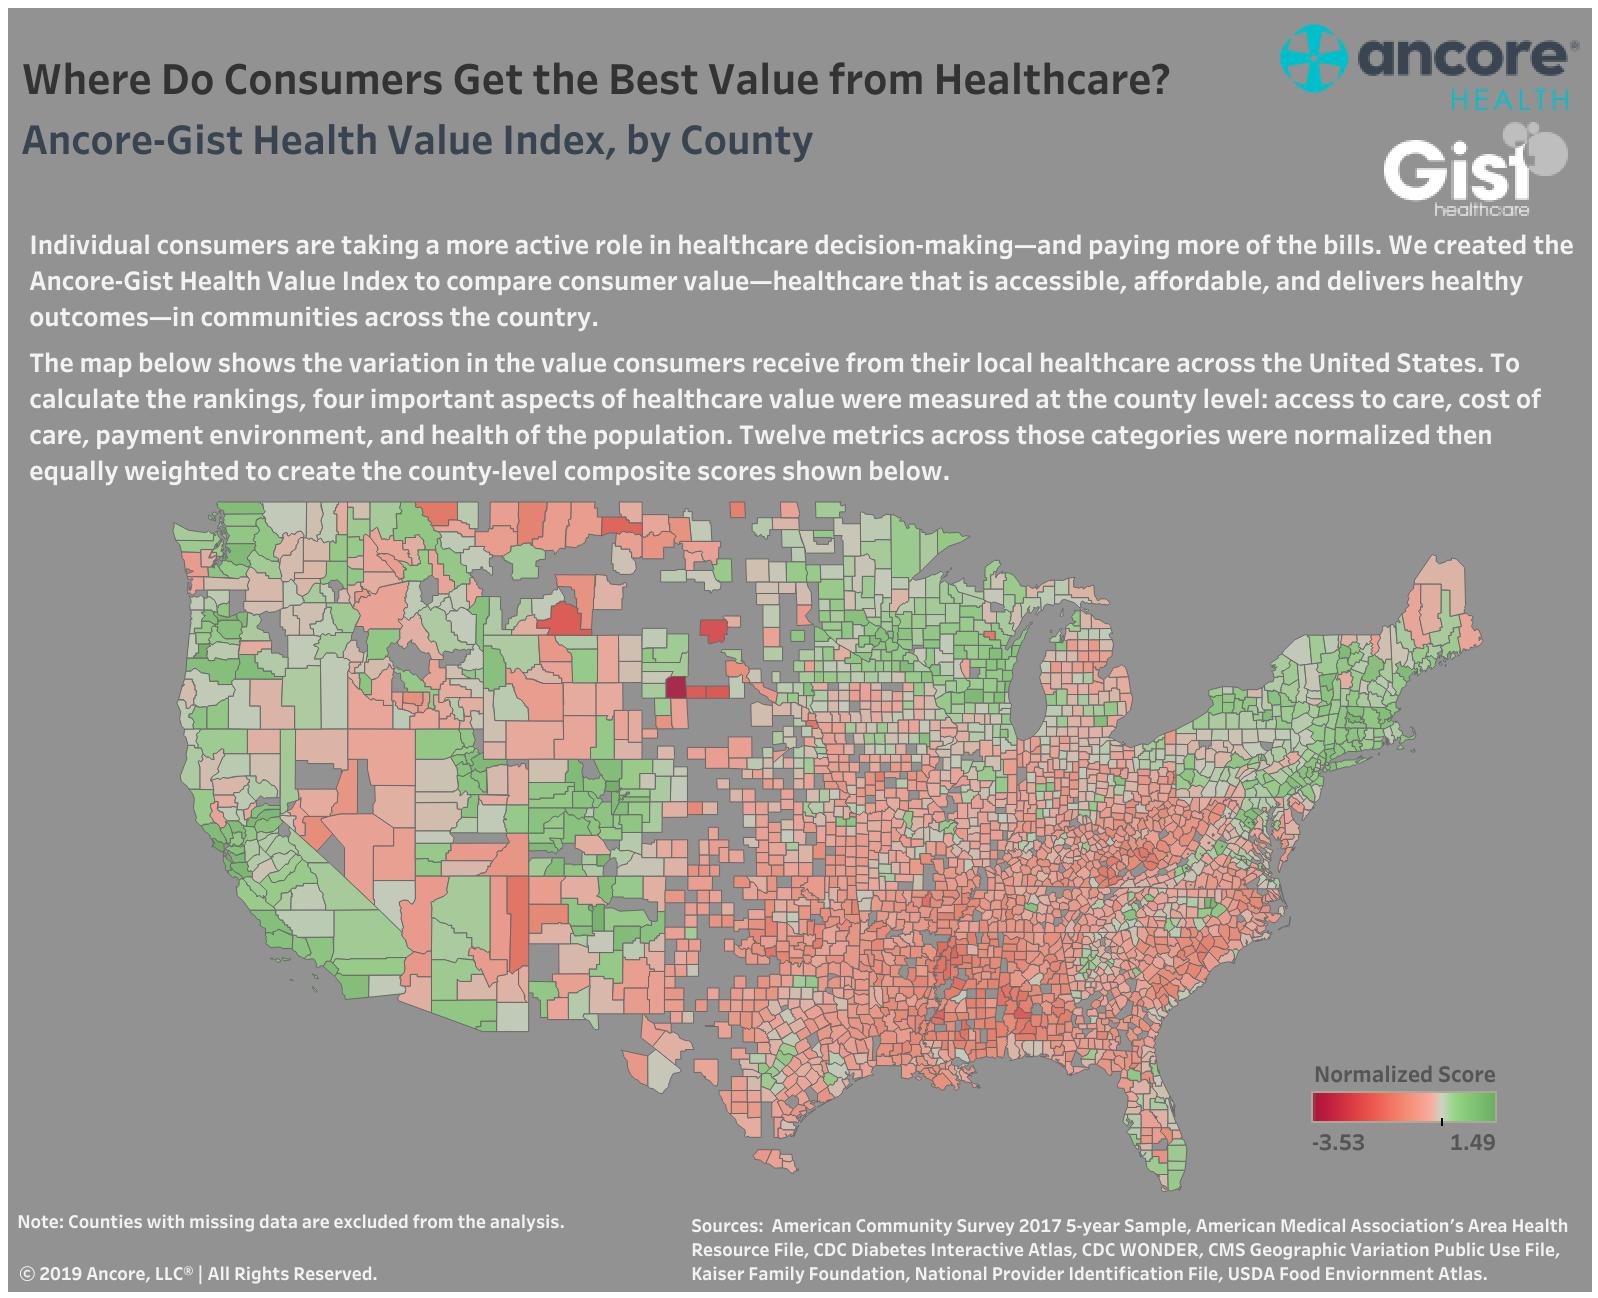 Ancore-Gist Health Value Index